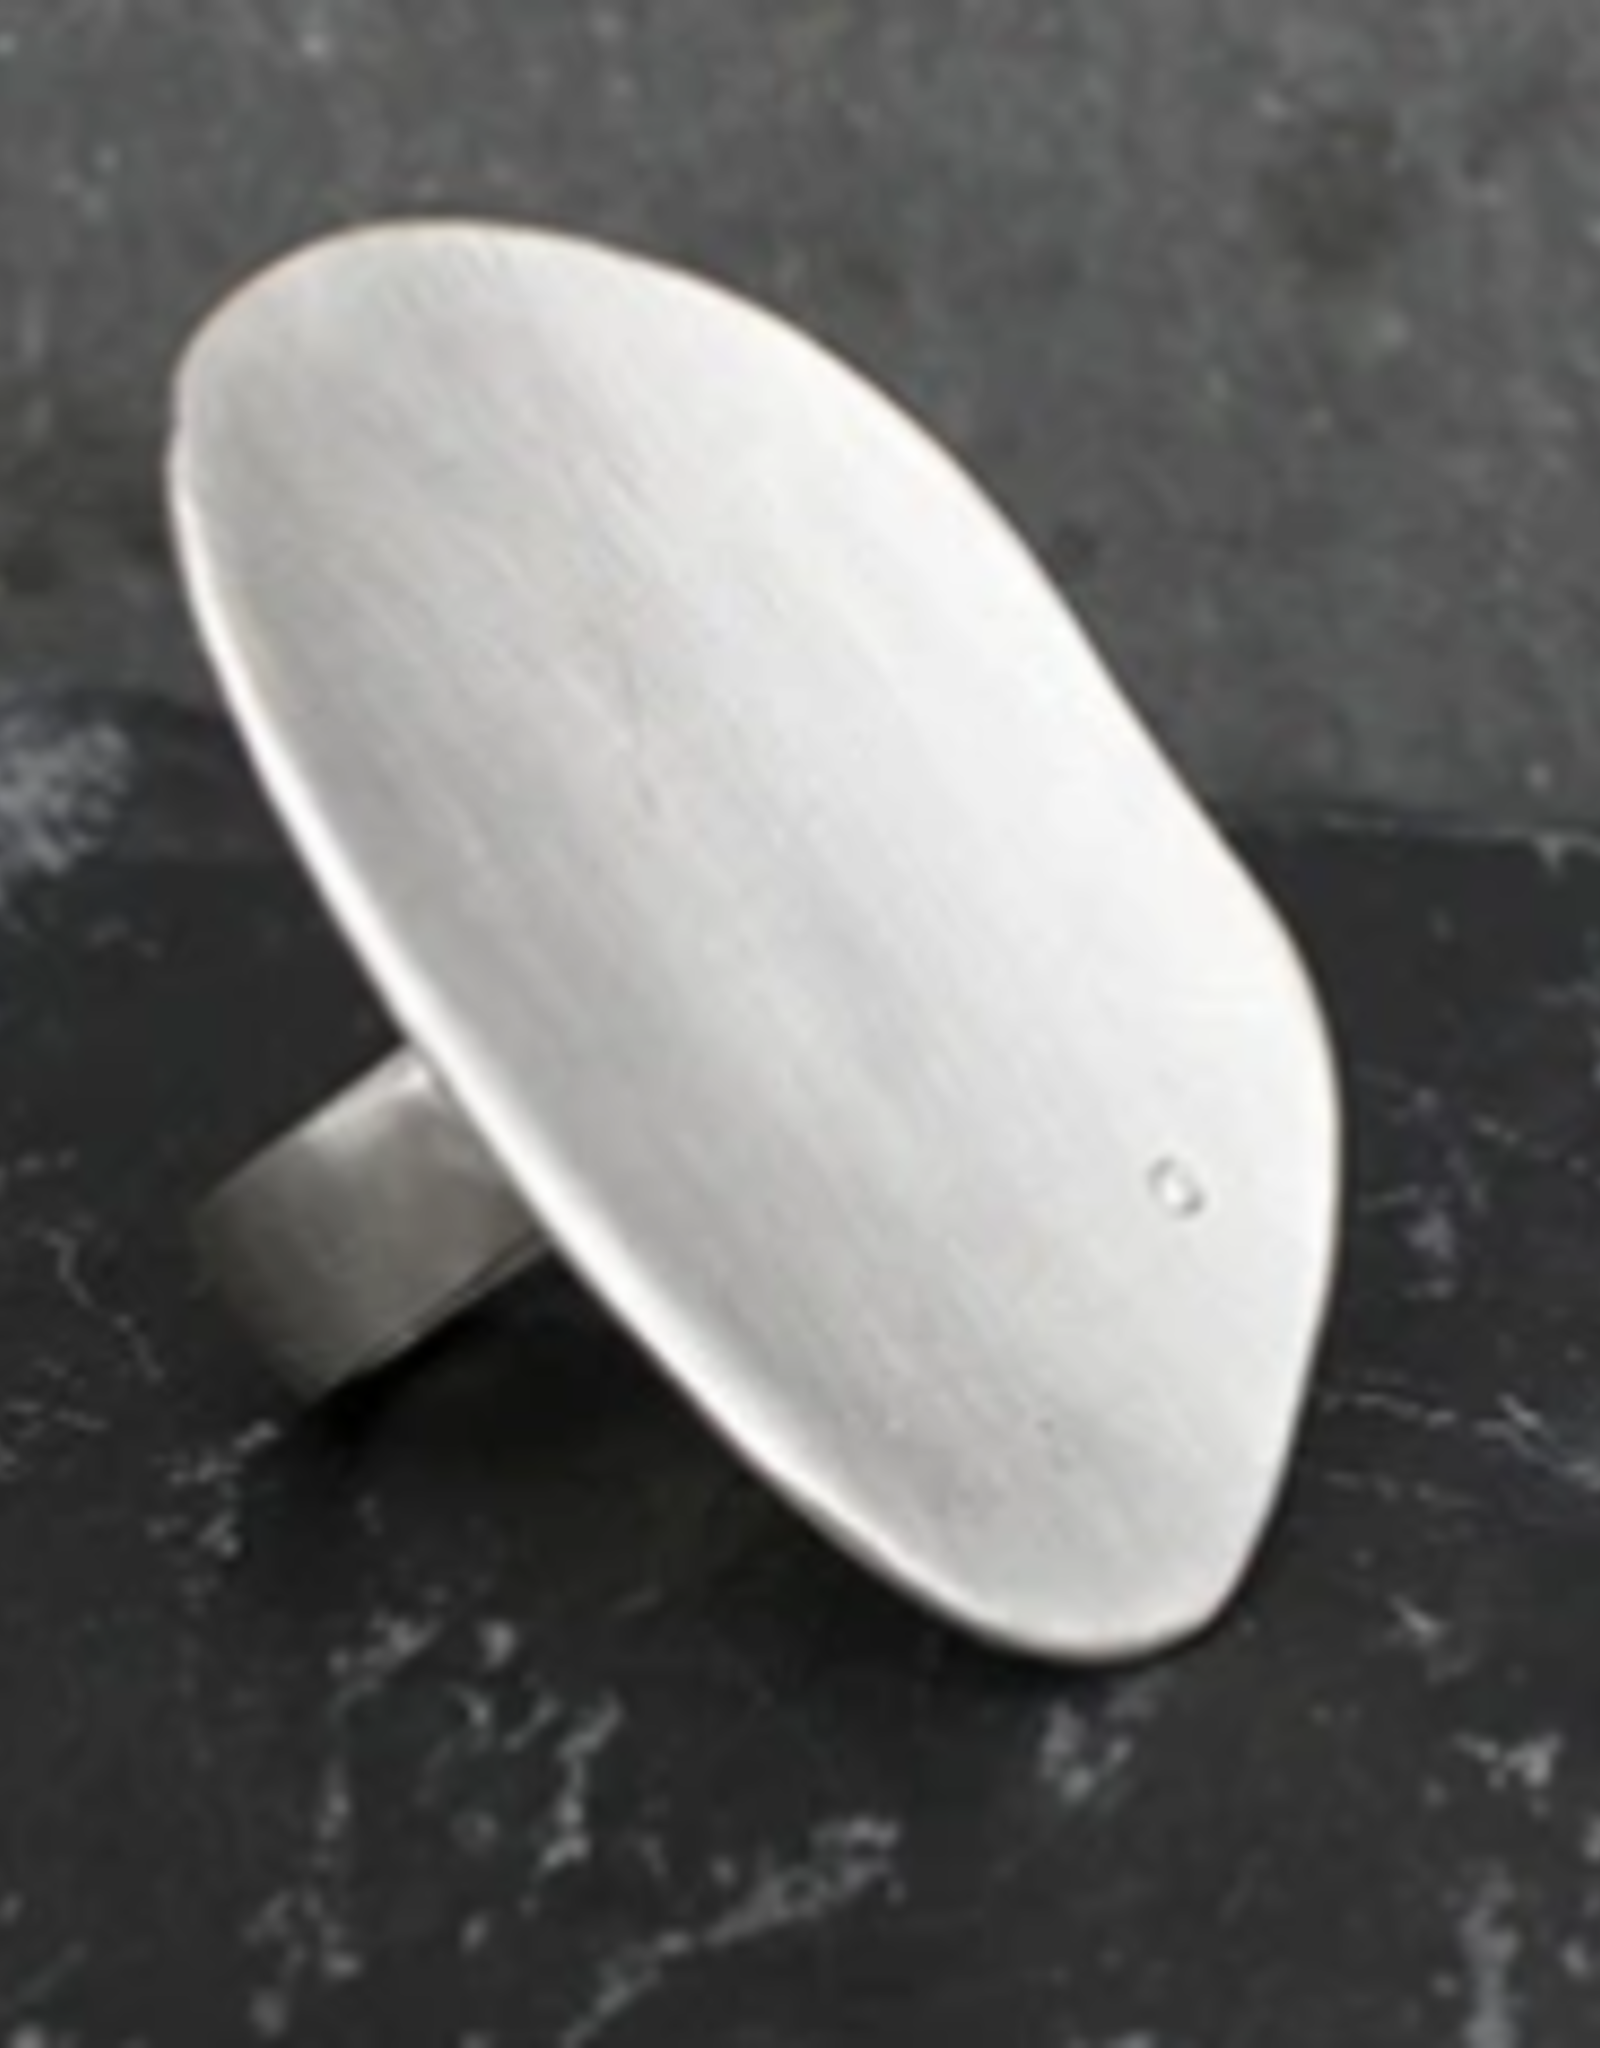 SAUNDRA MESSINGER DIVA OVAL RING WITH 1 DIAMOND